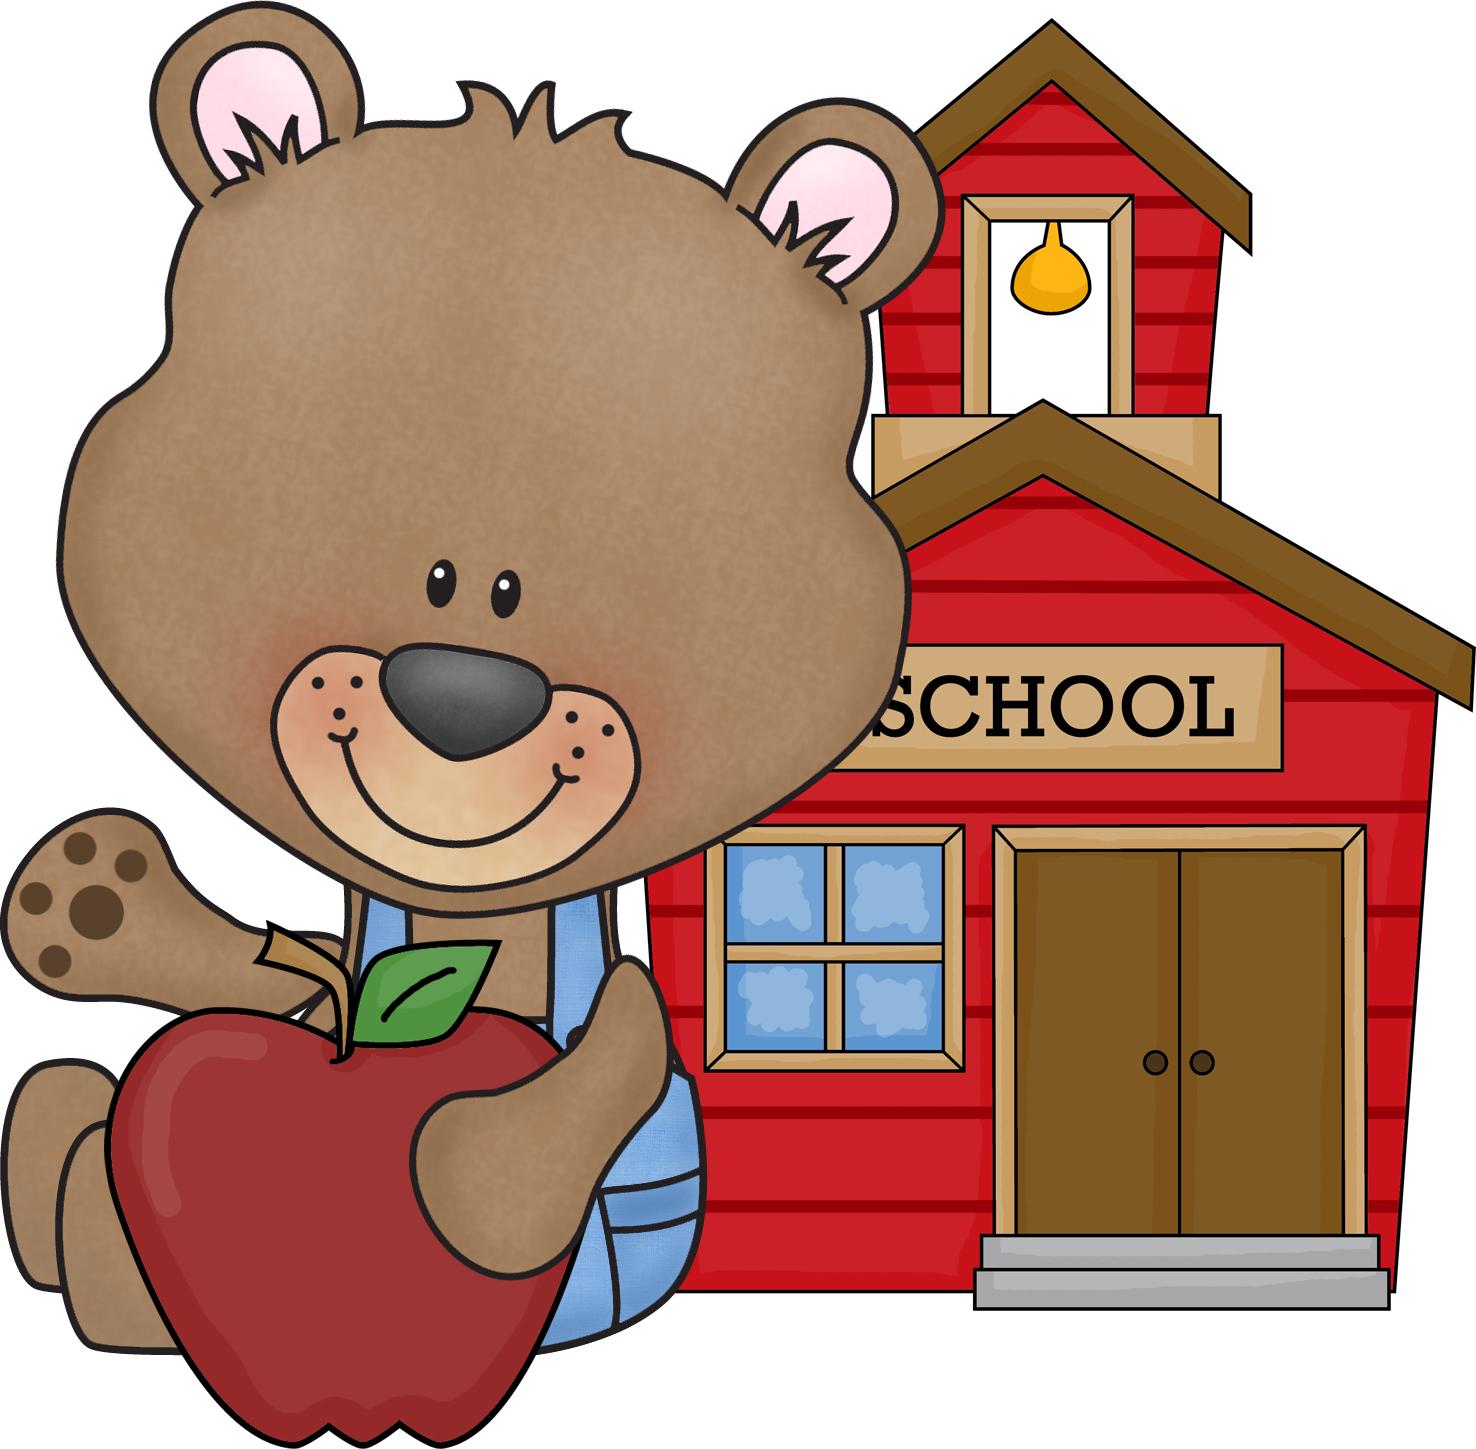 Clipart Decoration Classroom : Teaching munchkins lots of news fun classroom decor a